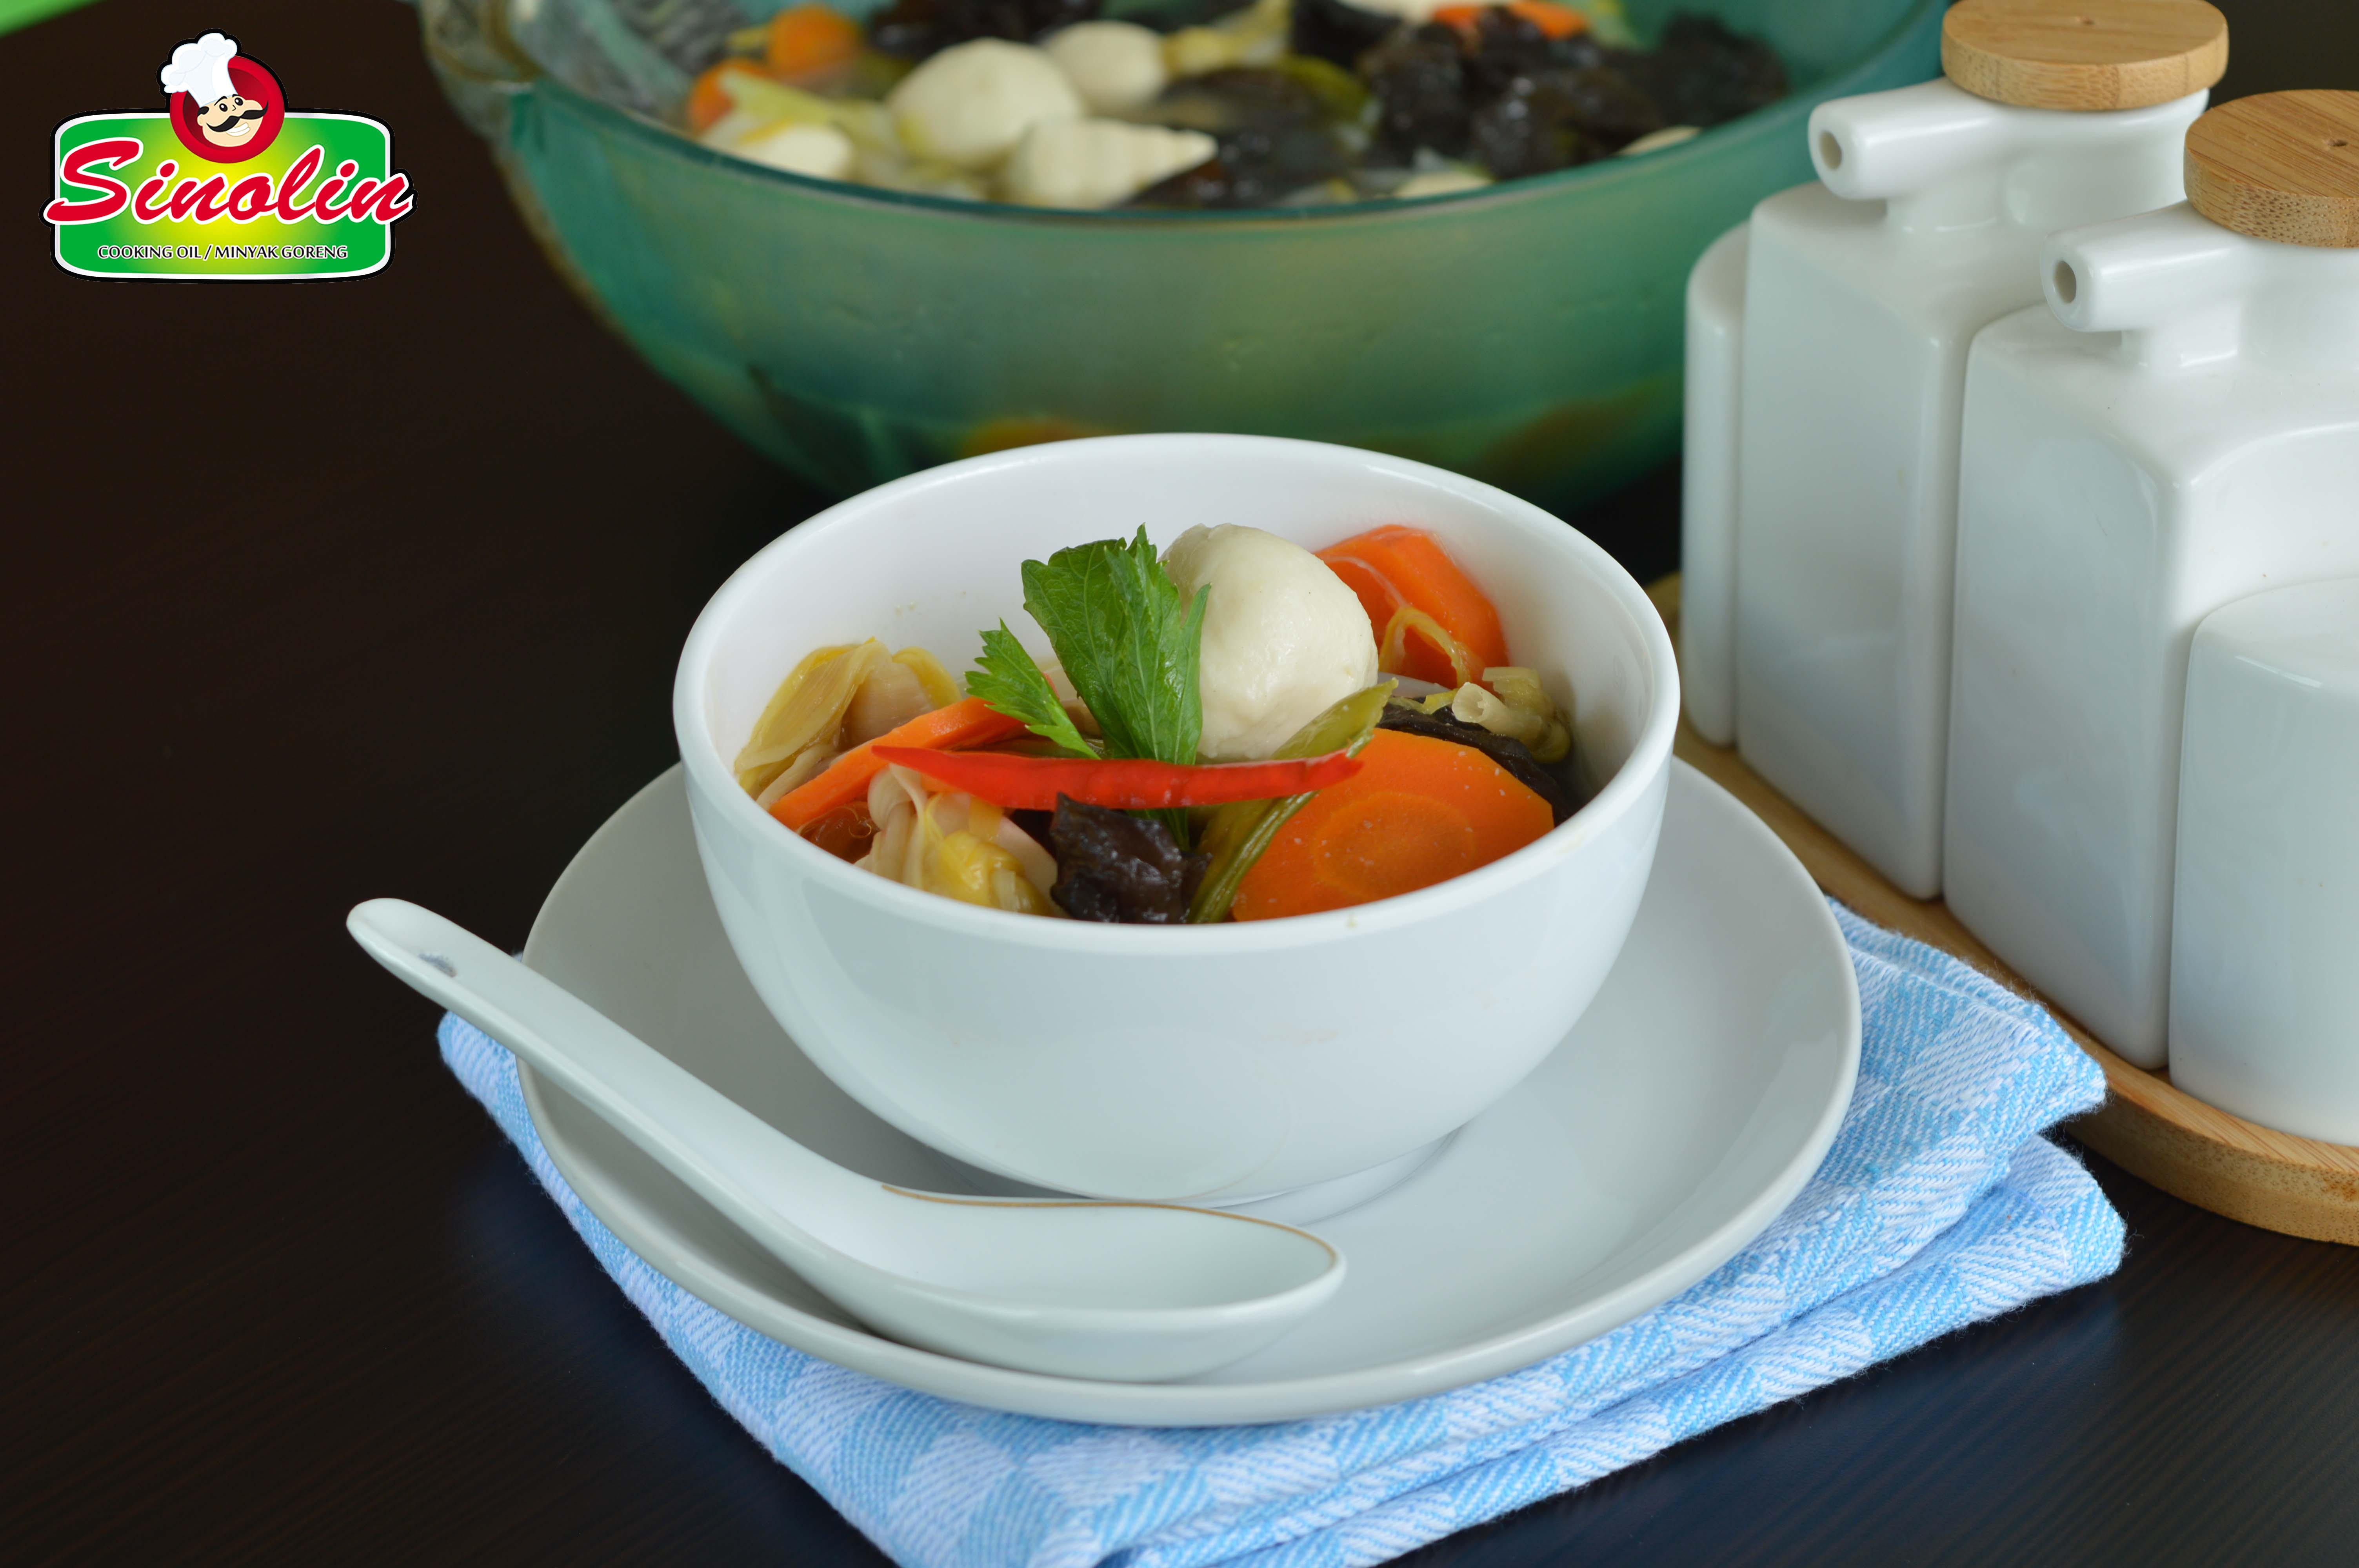 Kimlo Soup with White Tofu by Dapur Sinolin